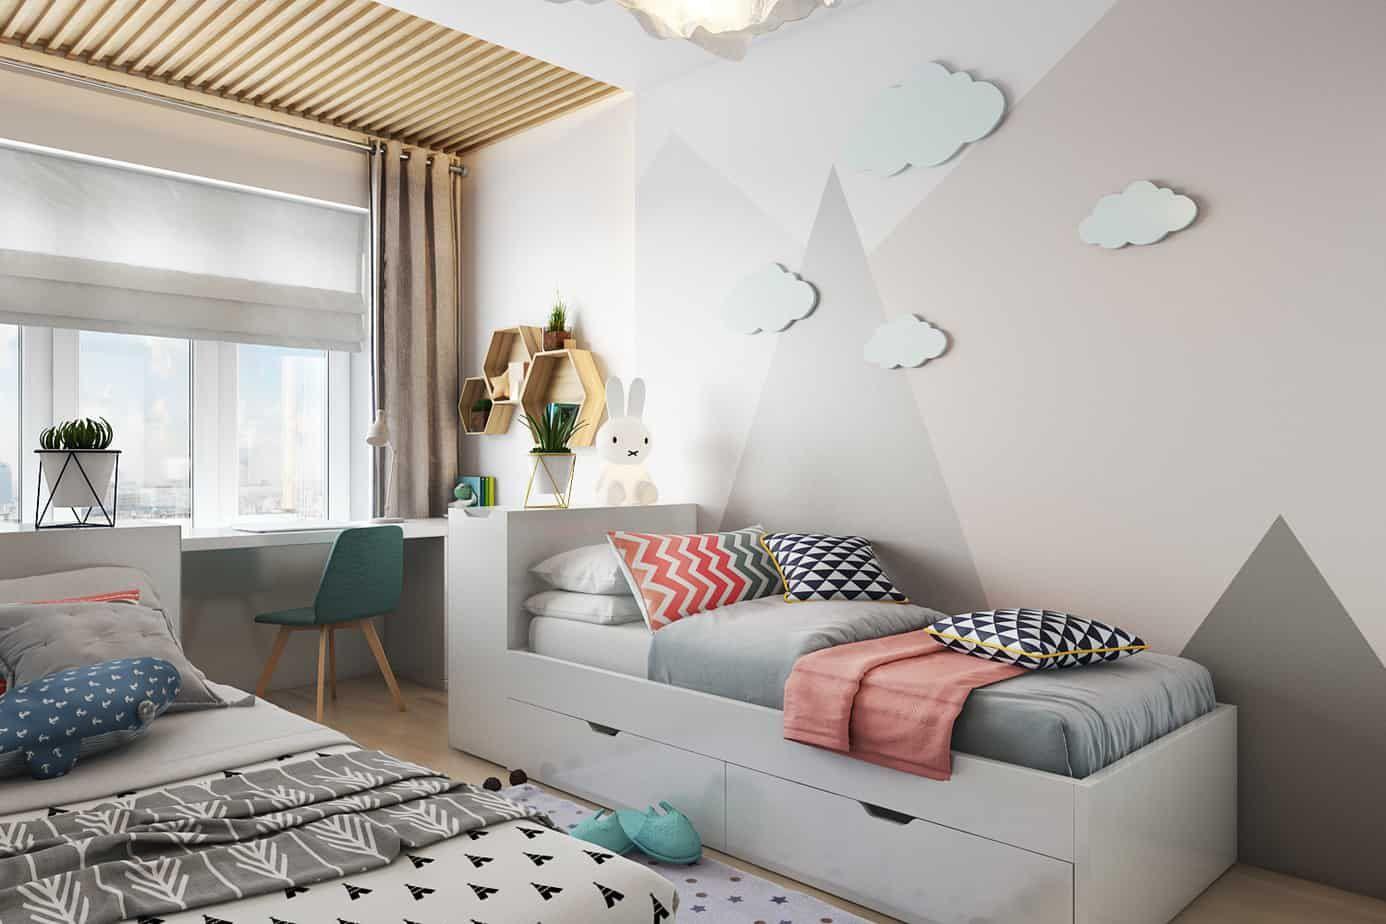 Kids Room Interior 2021 Pastel Colors In 2021 Baby Room Colors Bedroom Trends Kid Room Decor Kids room design 2021